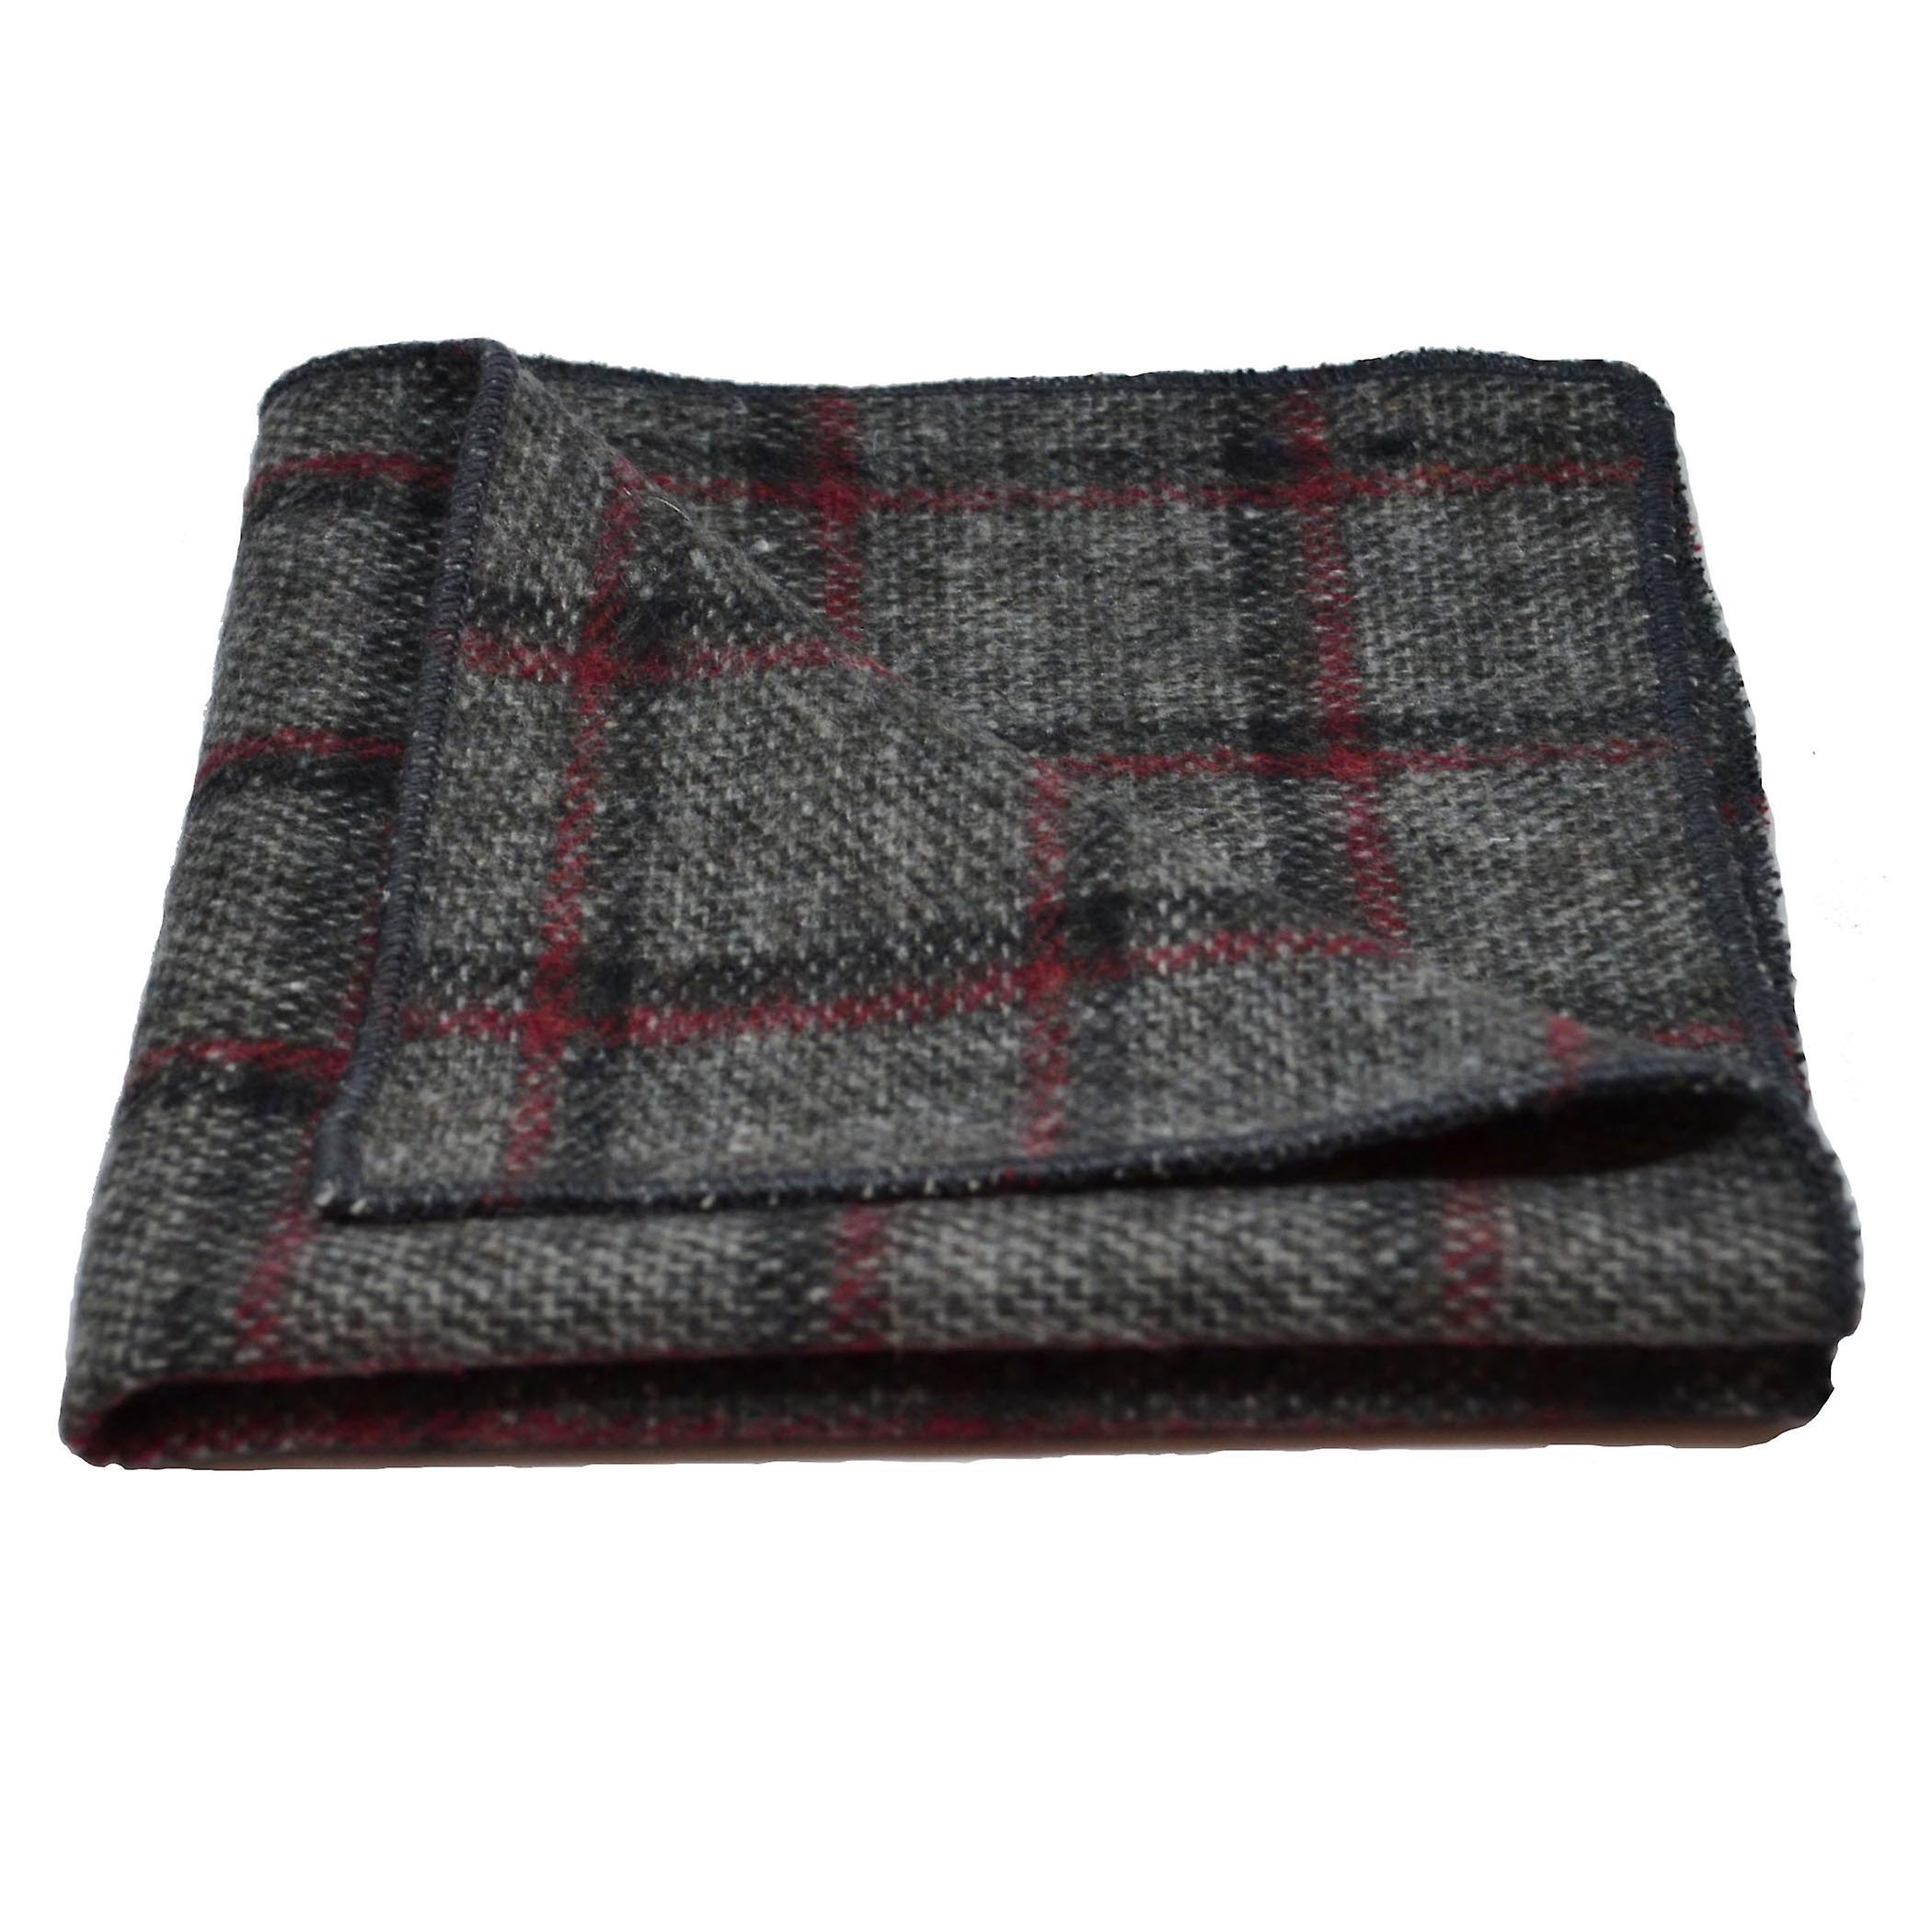 Heritage Pebble Grey Check Bow Tie & Pocket Square Set